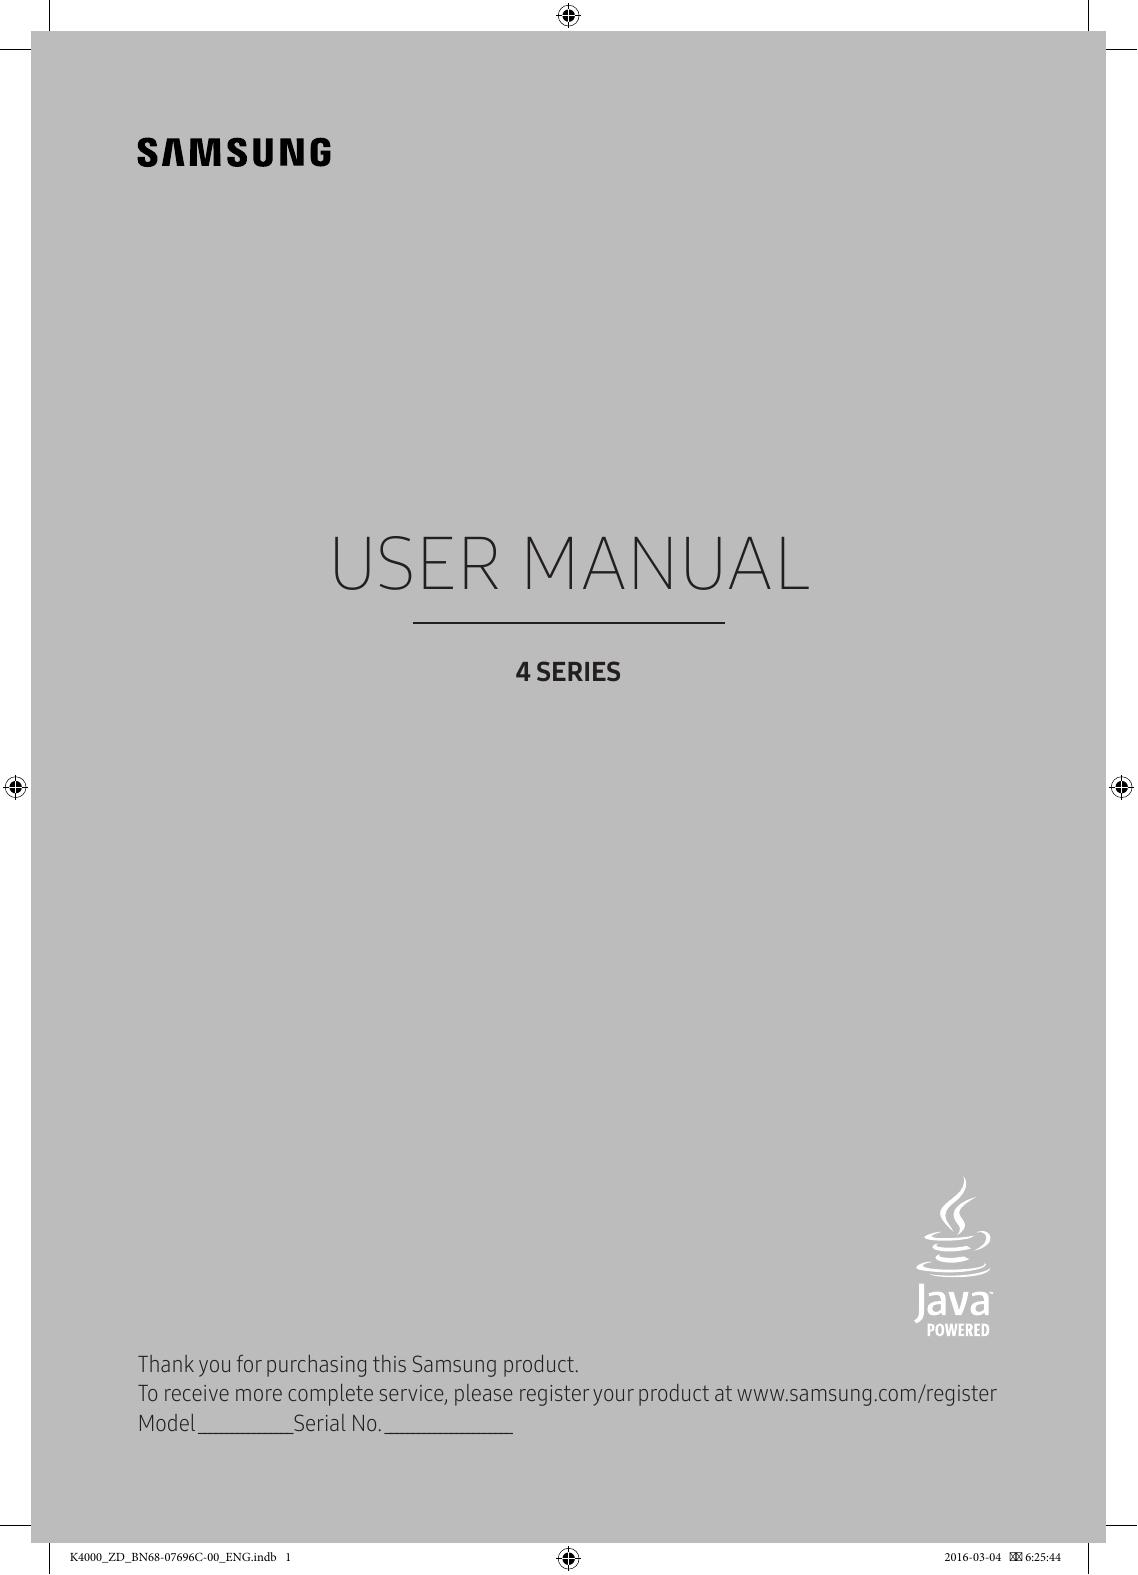 Samsung 24'' HD Flat TV K4000 Series 4 User Manual | Manualzz